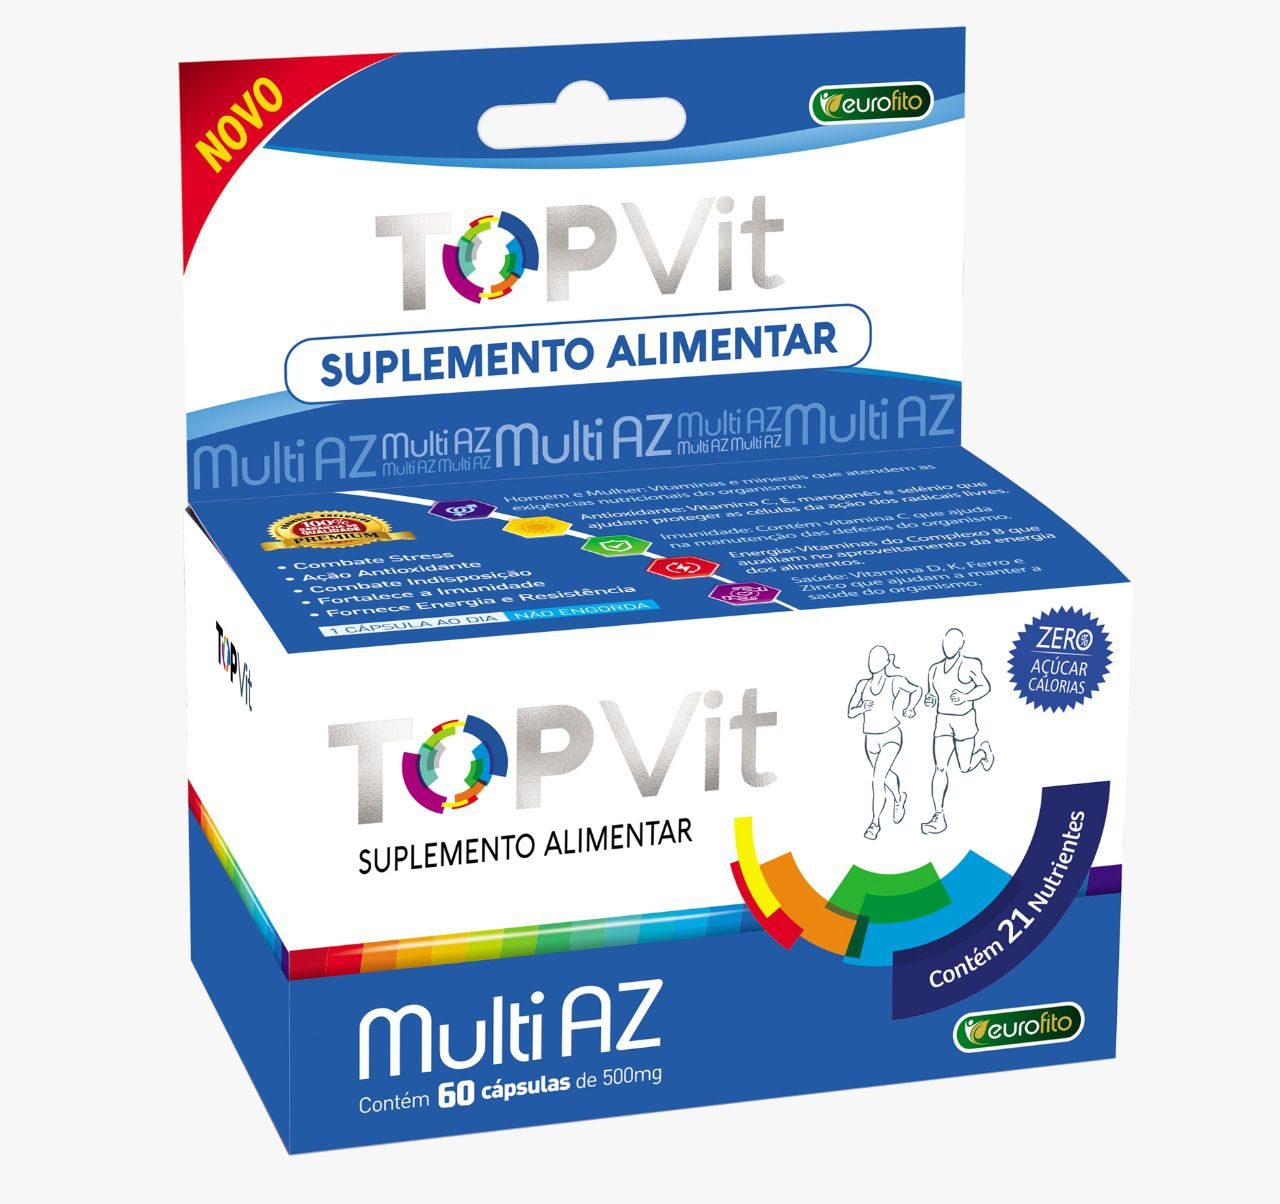 Top Vit Multi AZ 500mg (Polivitamínico)  - 60 cápsulas -  Eurofito